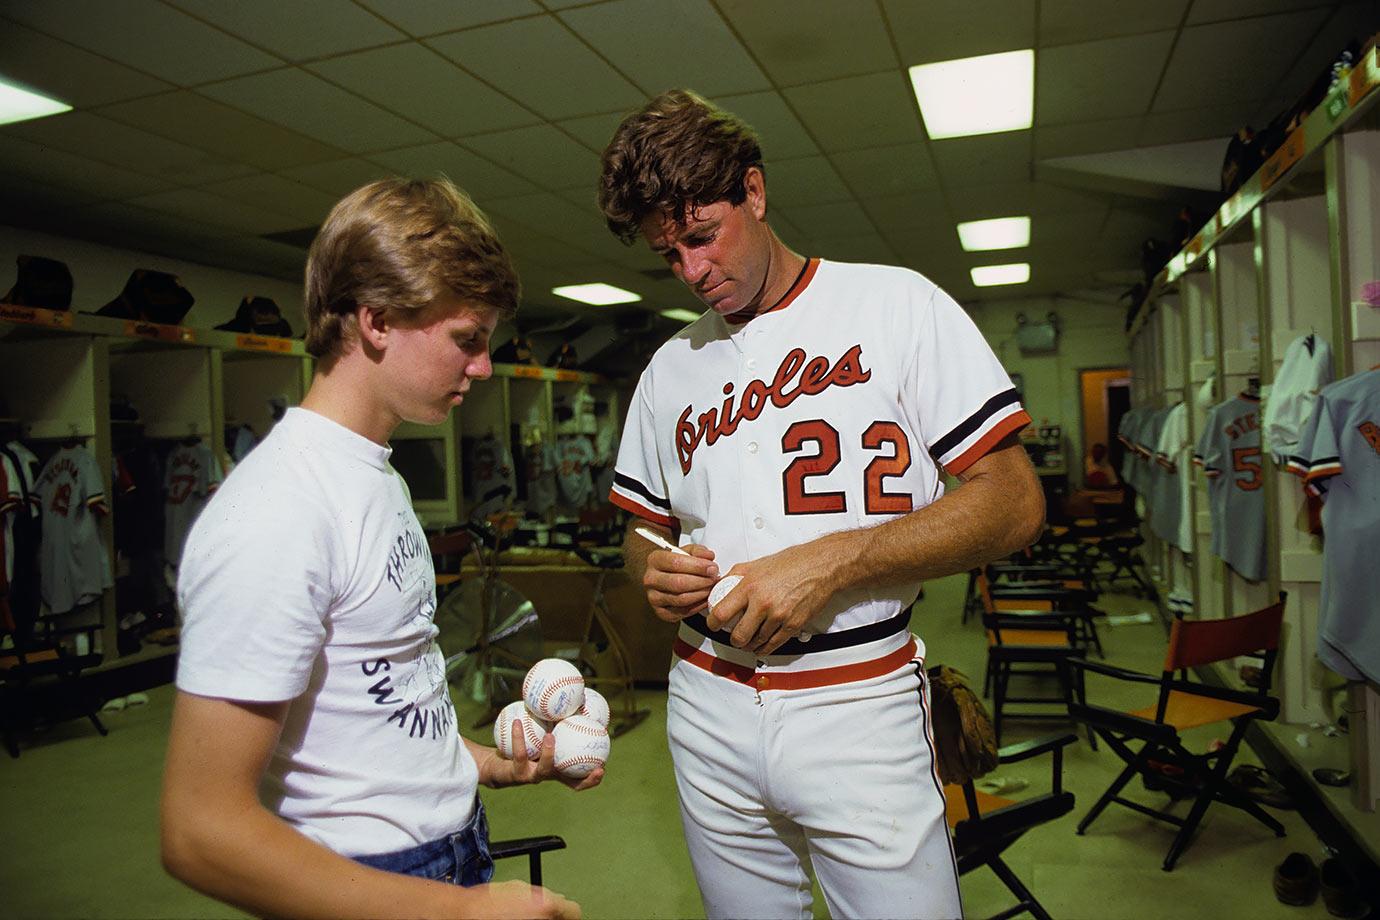 July 31, 1983 — Baltimore Orioles vs. Texas Rangers